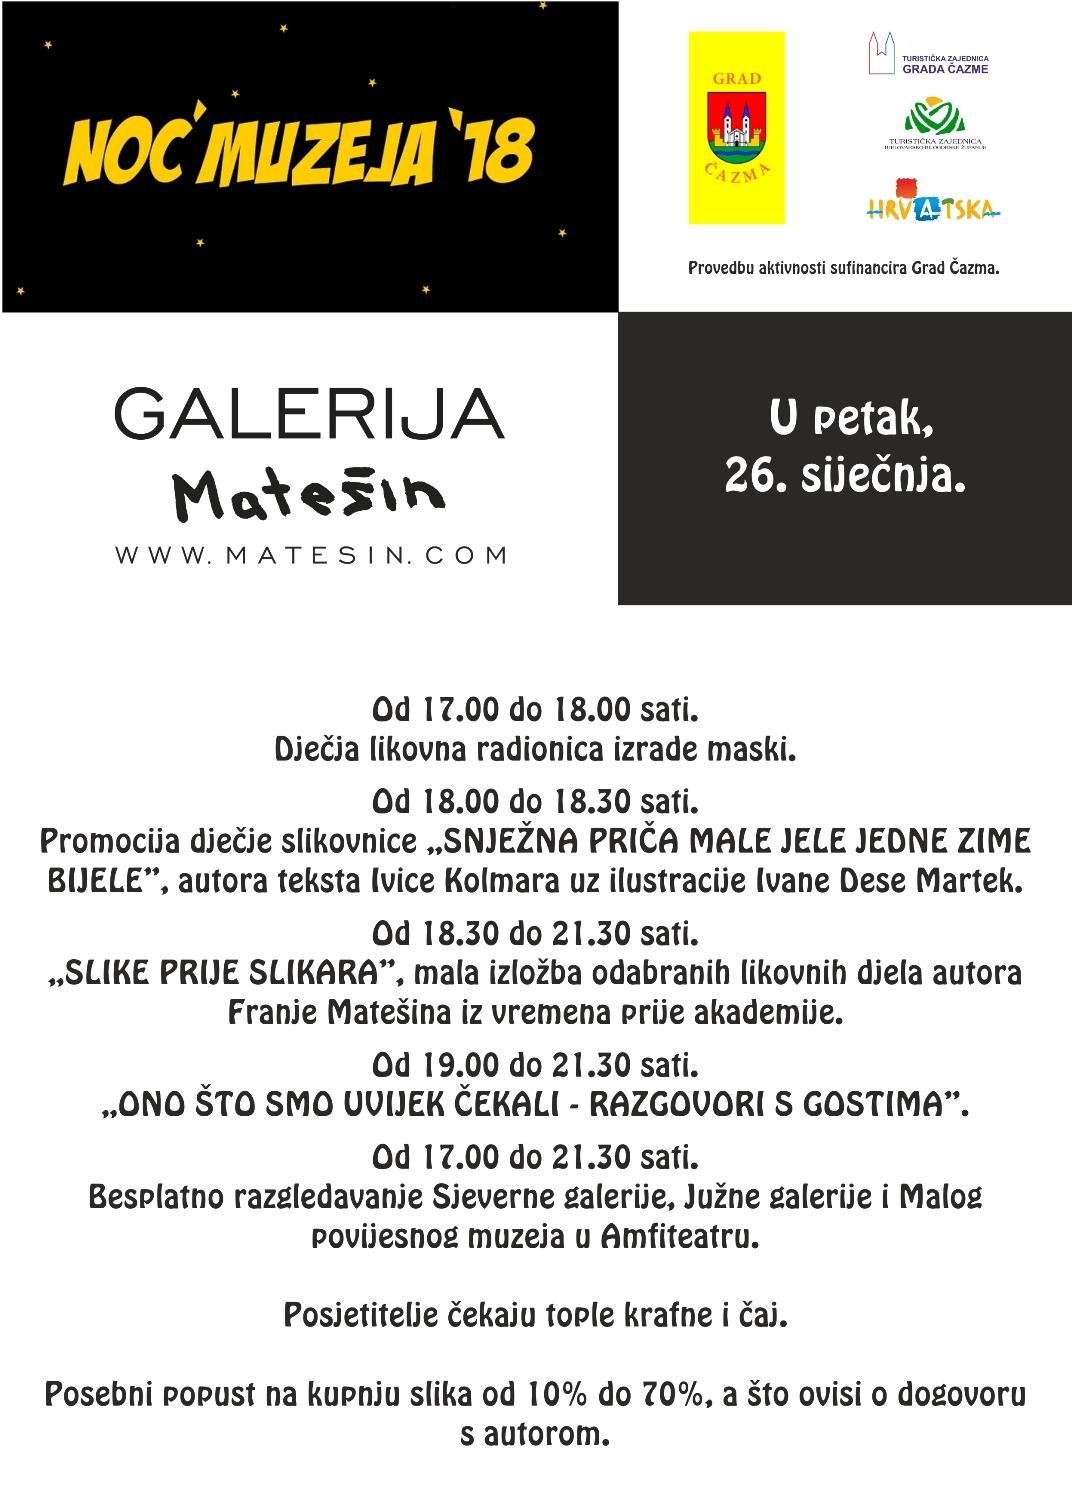 Noć muzeja - Galerija Matešin